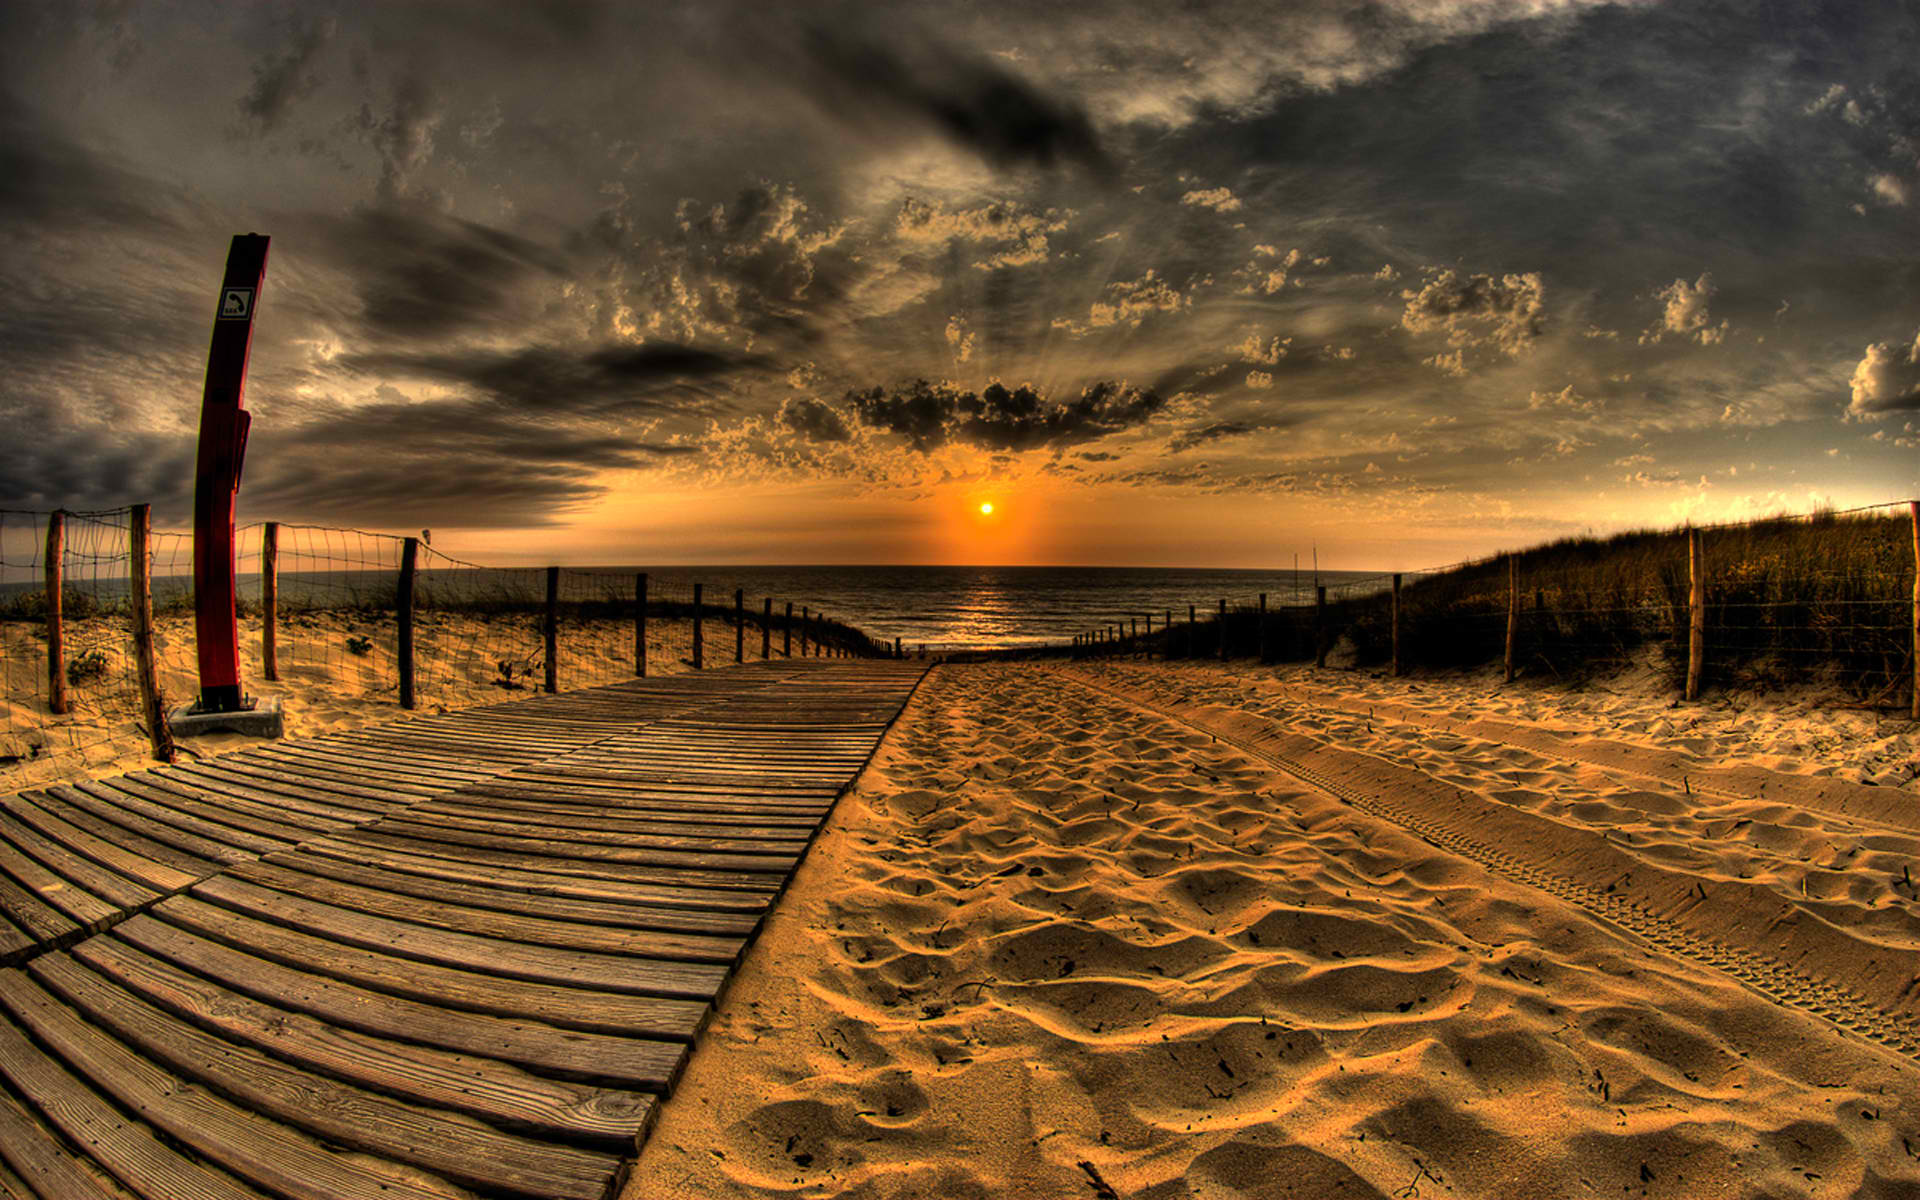 Beach Cloud Earth Fence Sand Sun Sunset Water 1920x1200